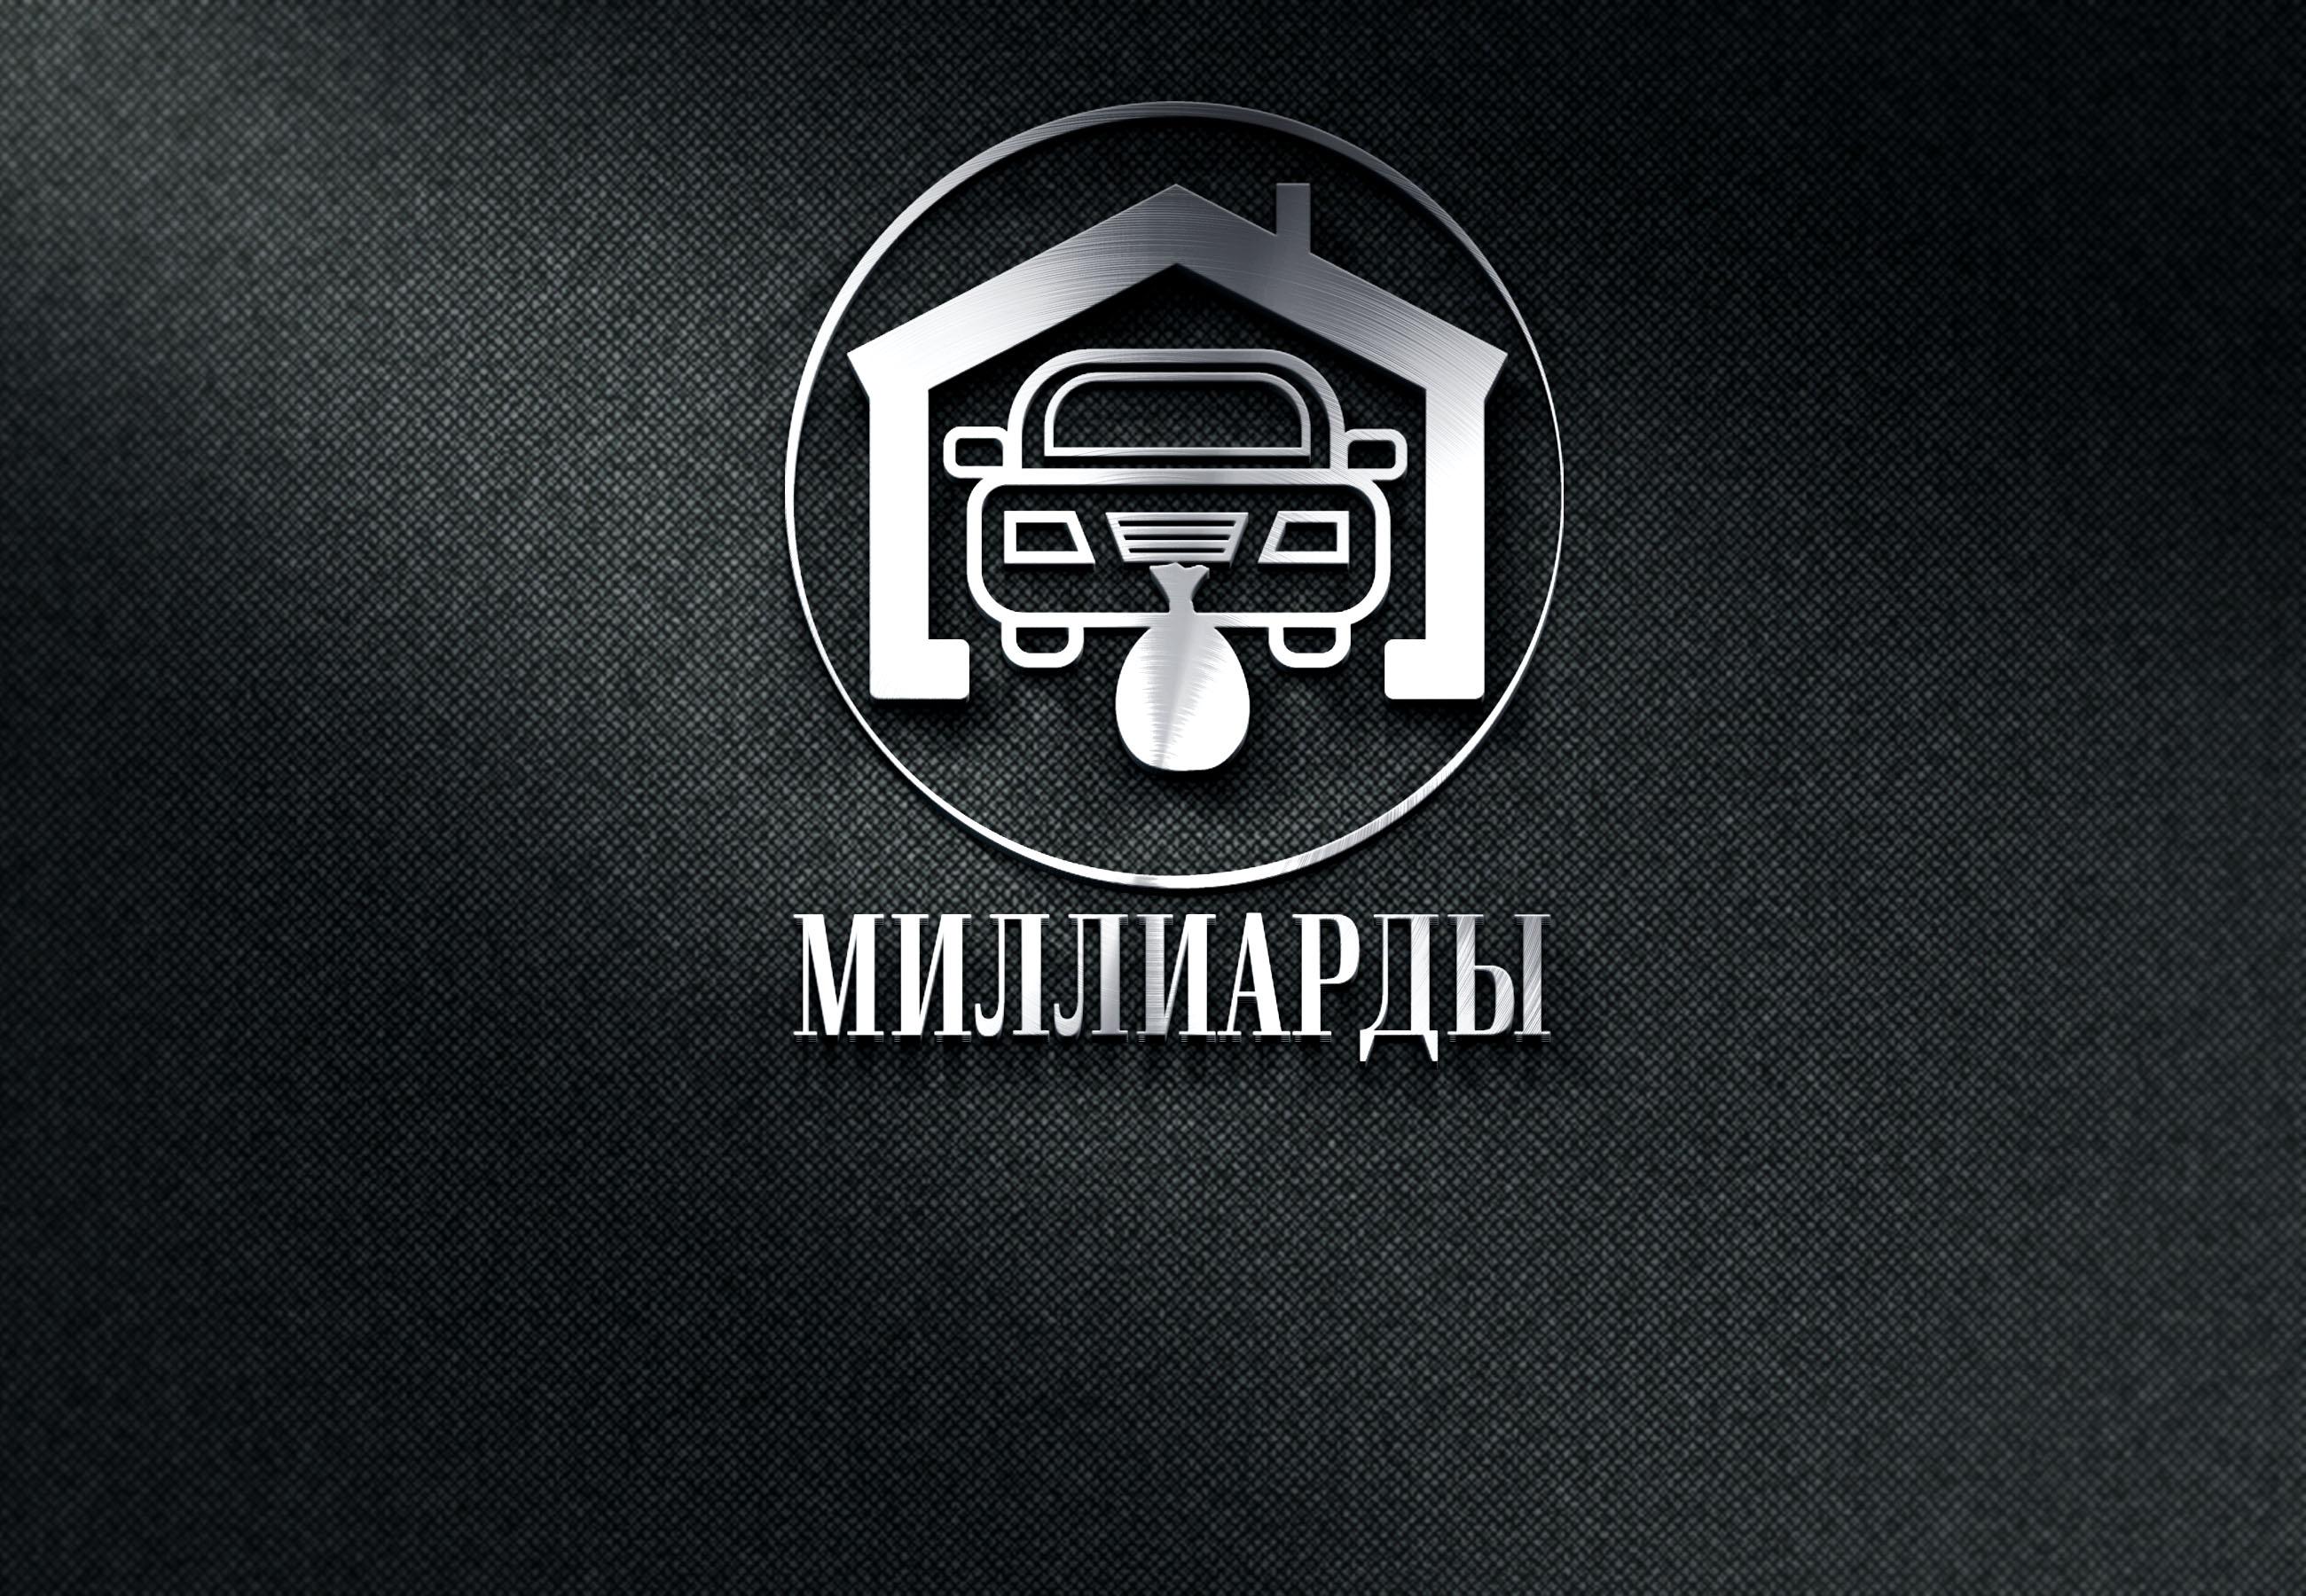 Создание логотипа фото f_2335e41598b428f3.jpg